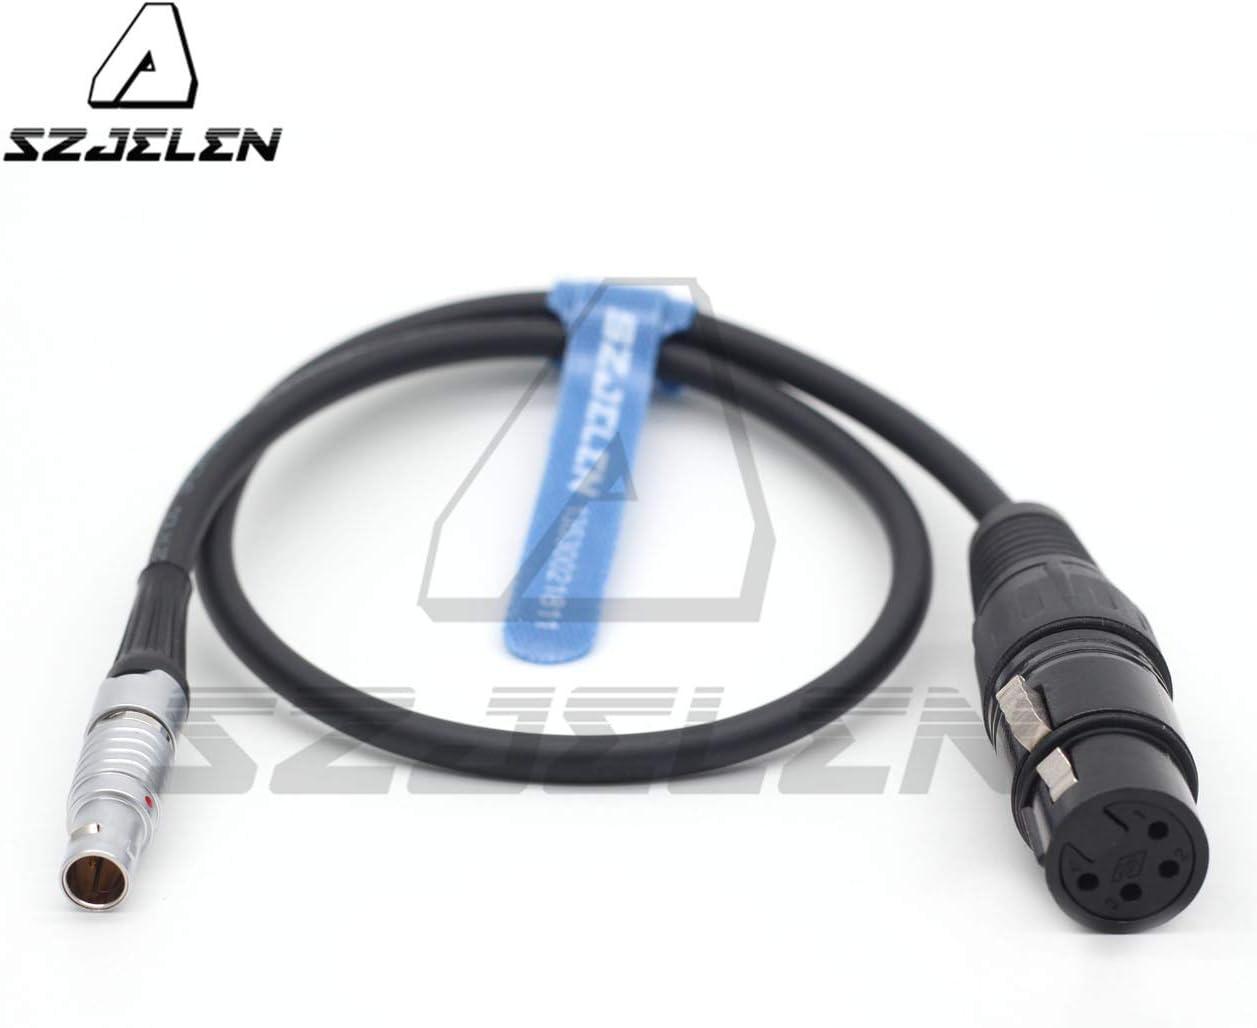 60CM SZJELEN ARRI 12V 0B 2 pin Power Out to XLR 4pin Female for Panasonic Monitor Power Cord